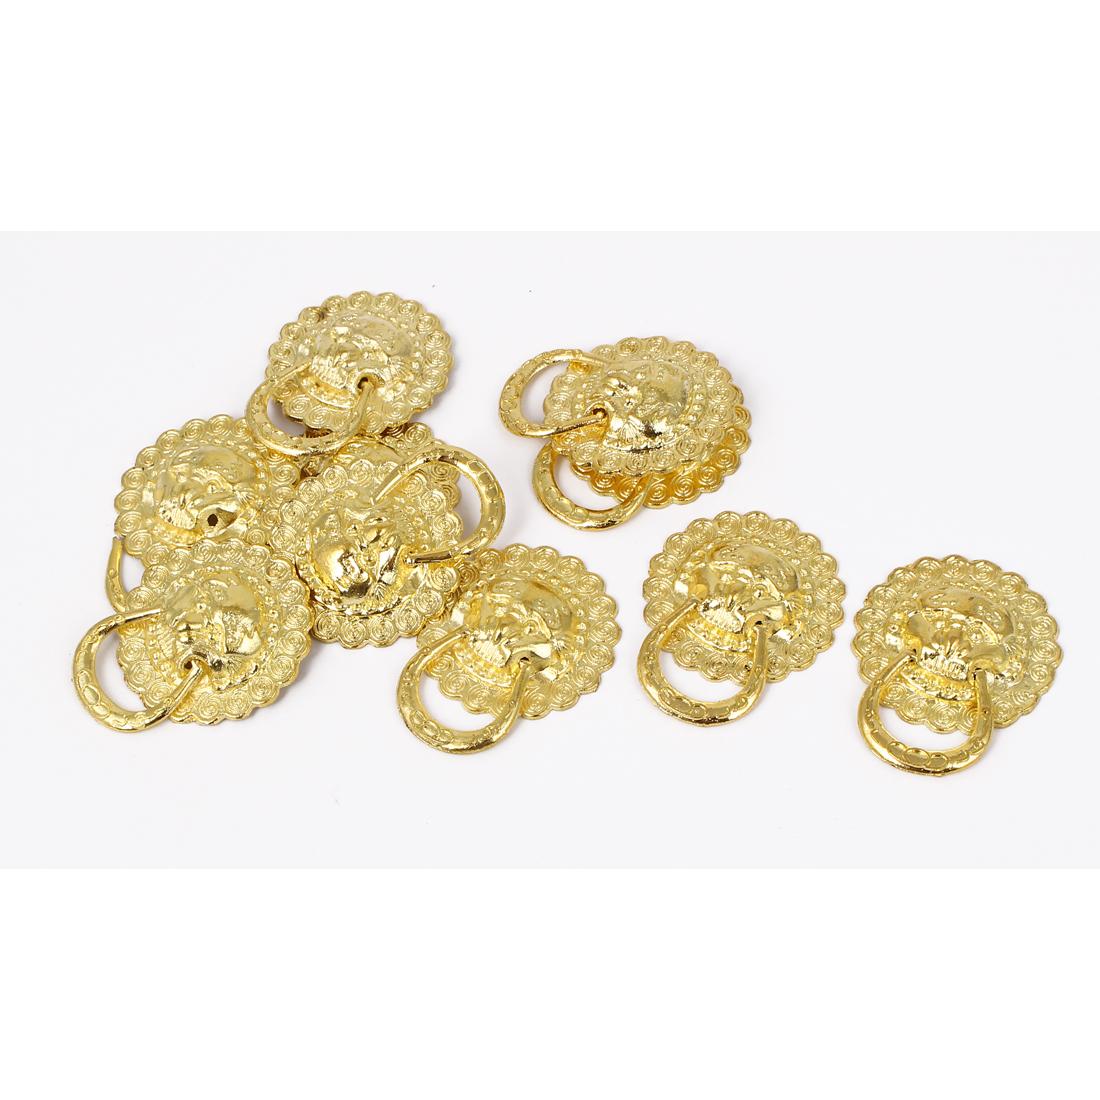 L362E5 Jewellery Box Showcase Lion Head Design Pull Handle Ring Knob 10pcs